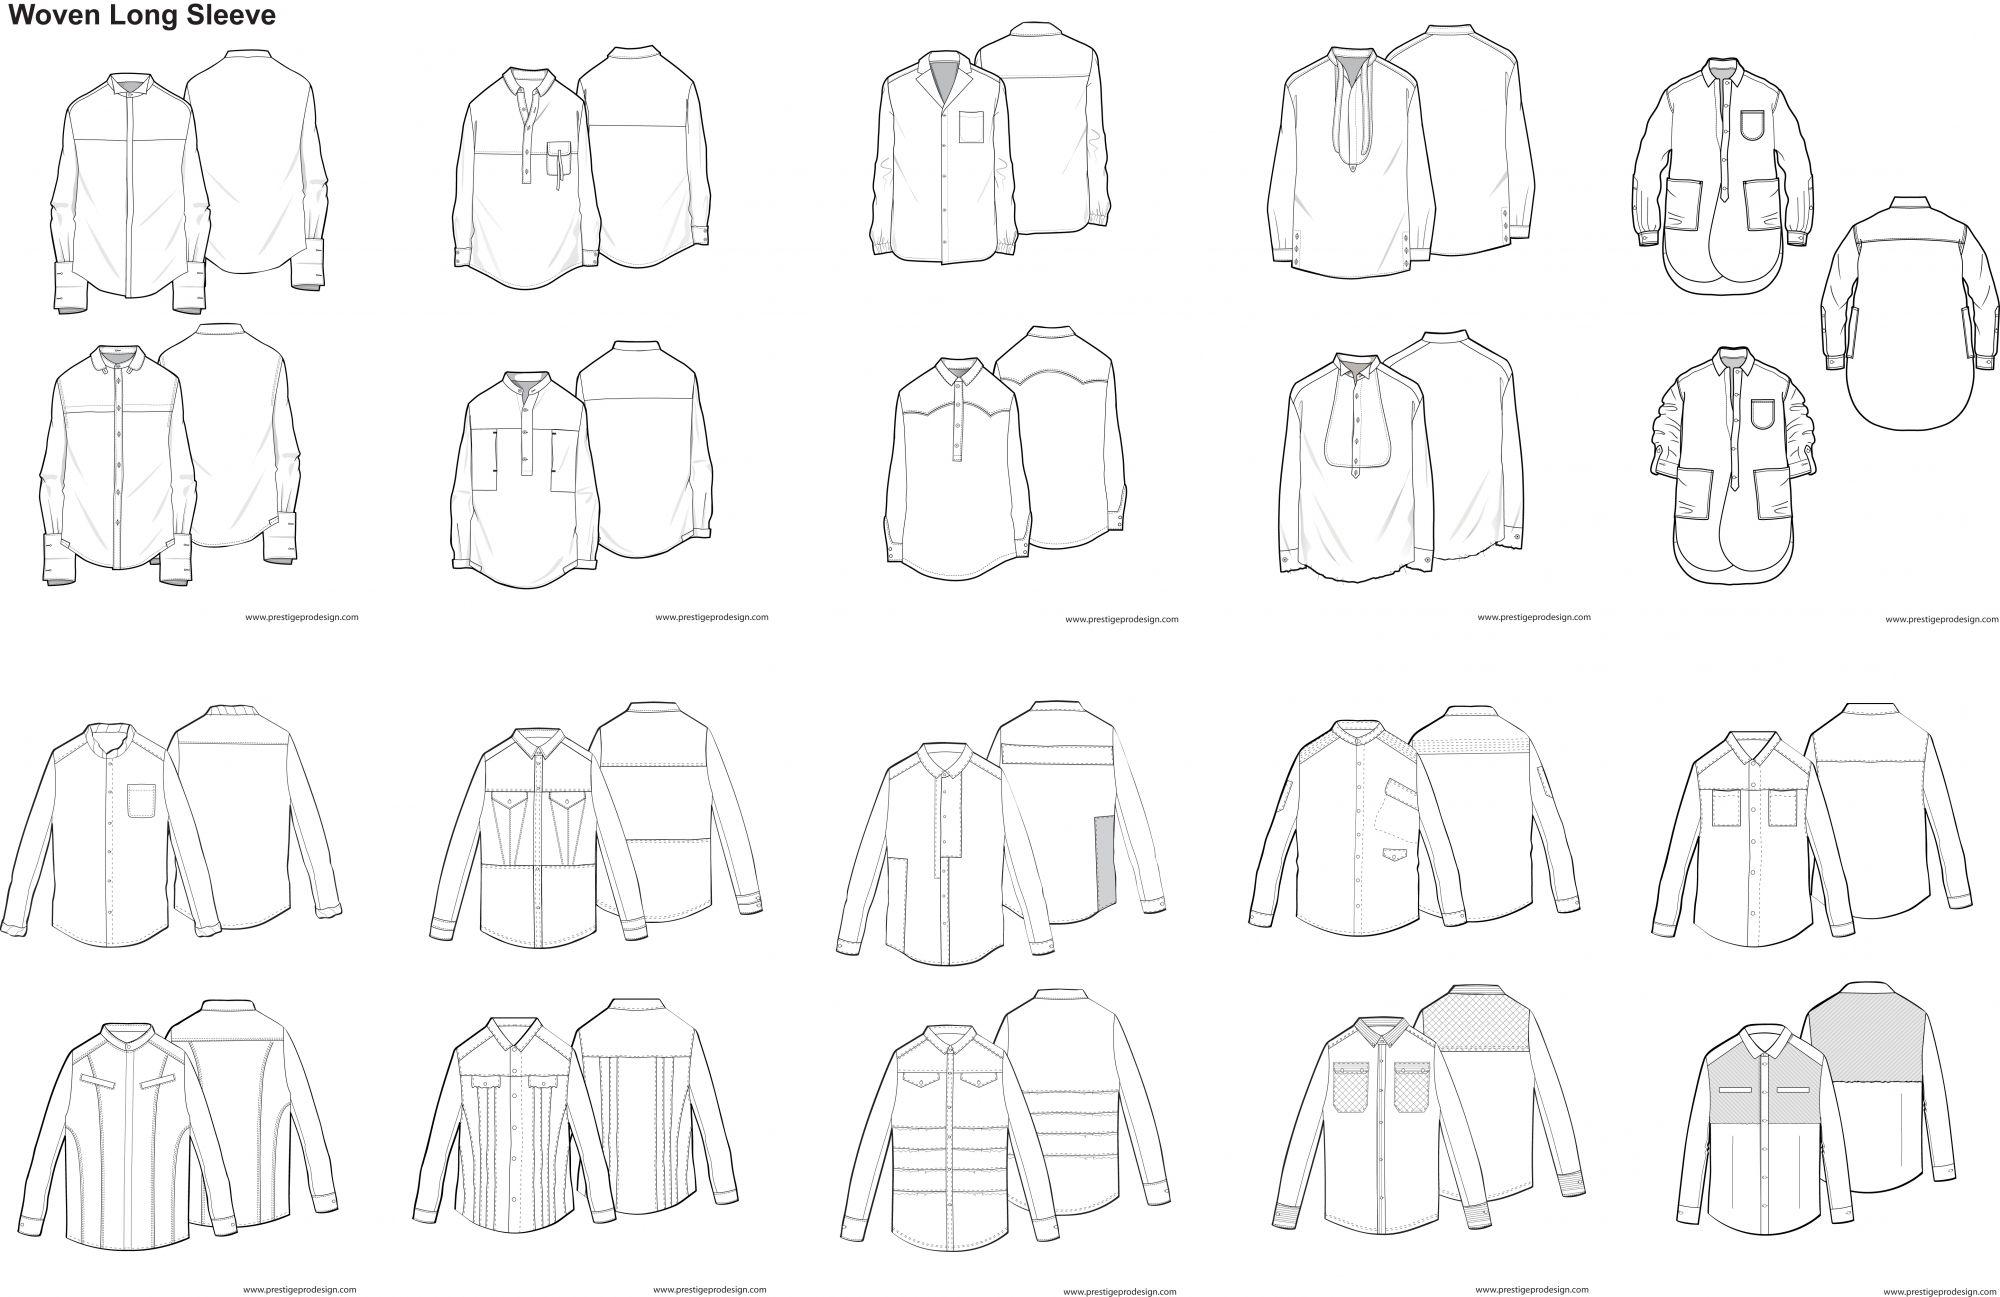 Illustrator Fashion Design Template | szablony ubran | Pinterest ...